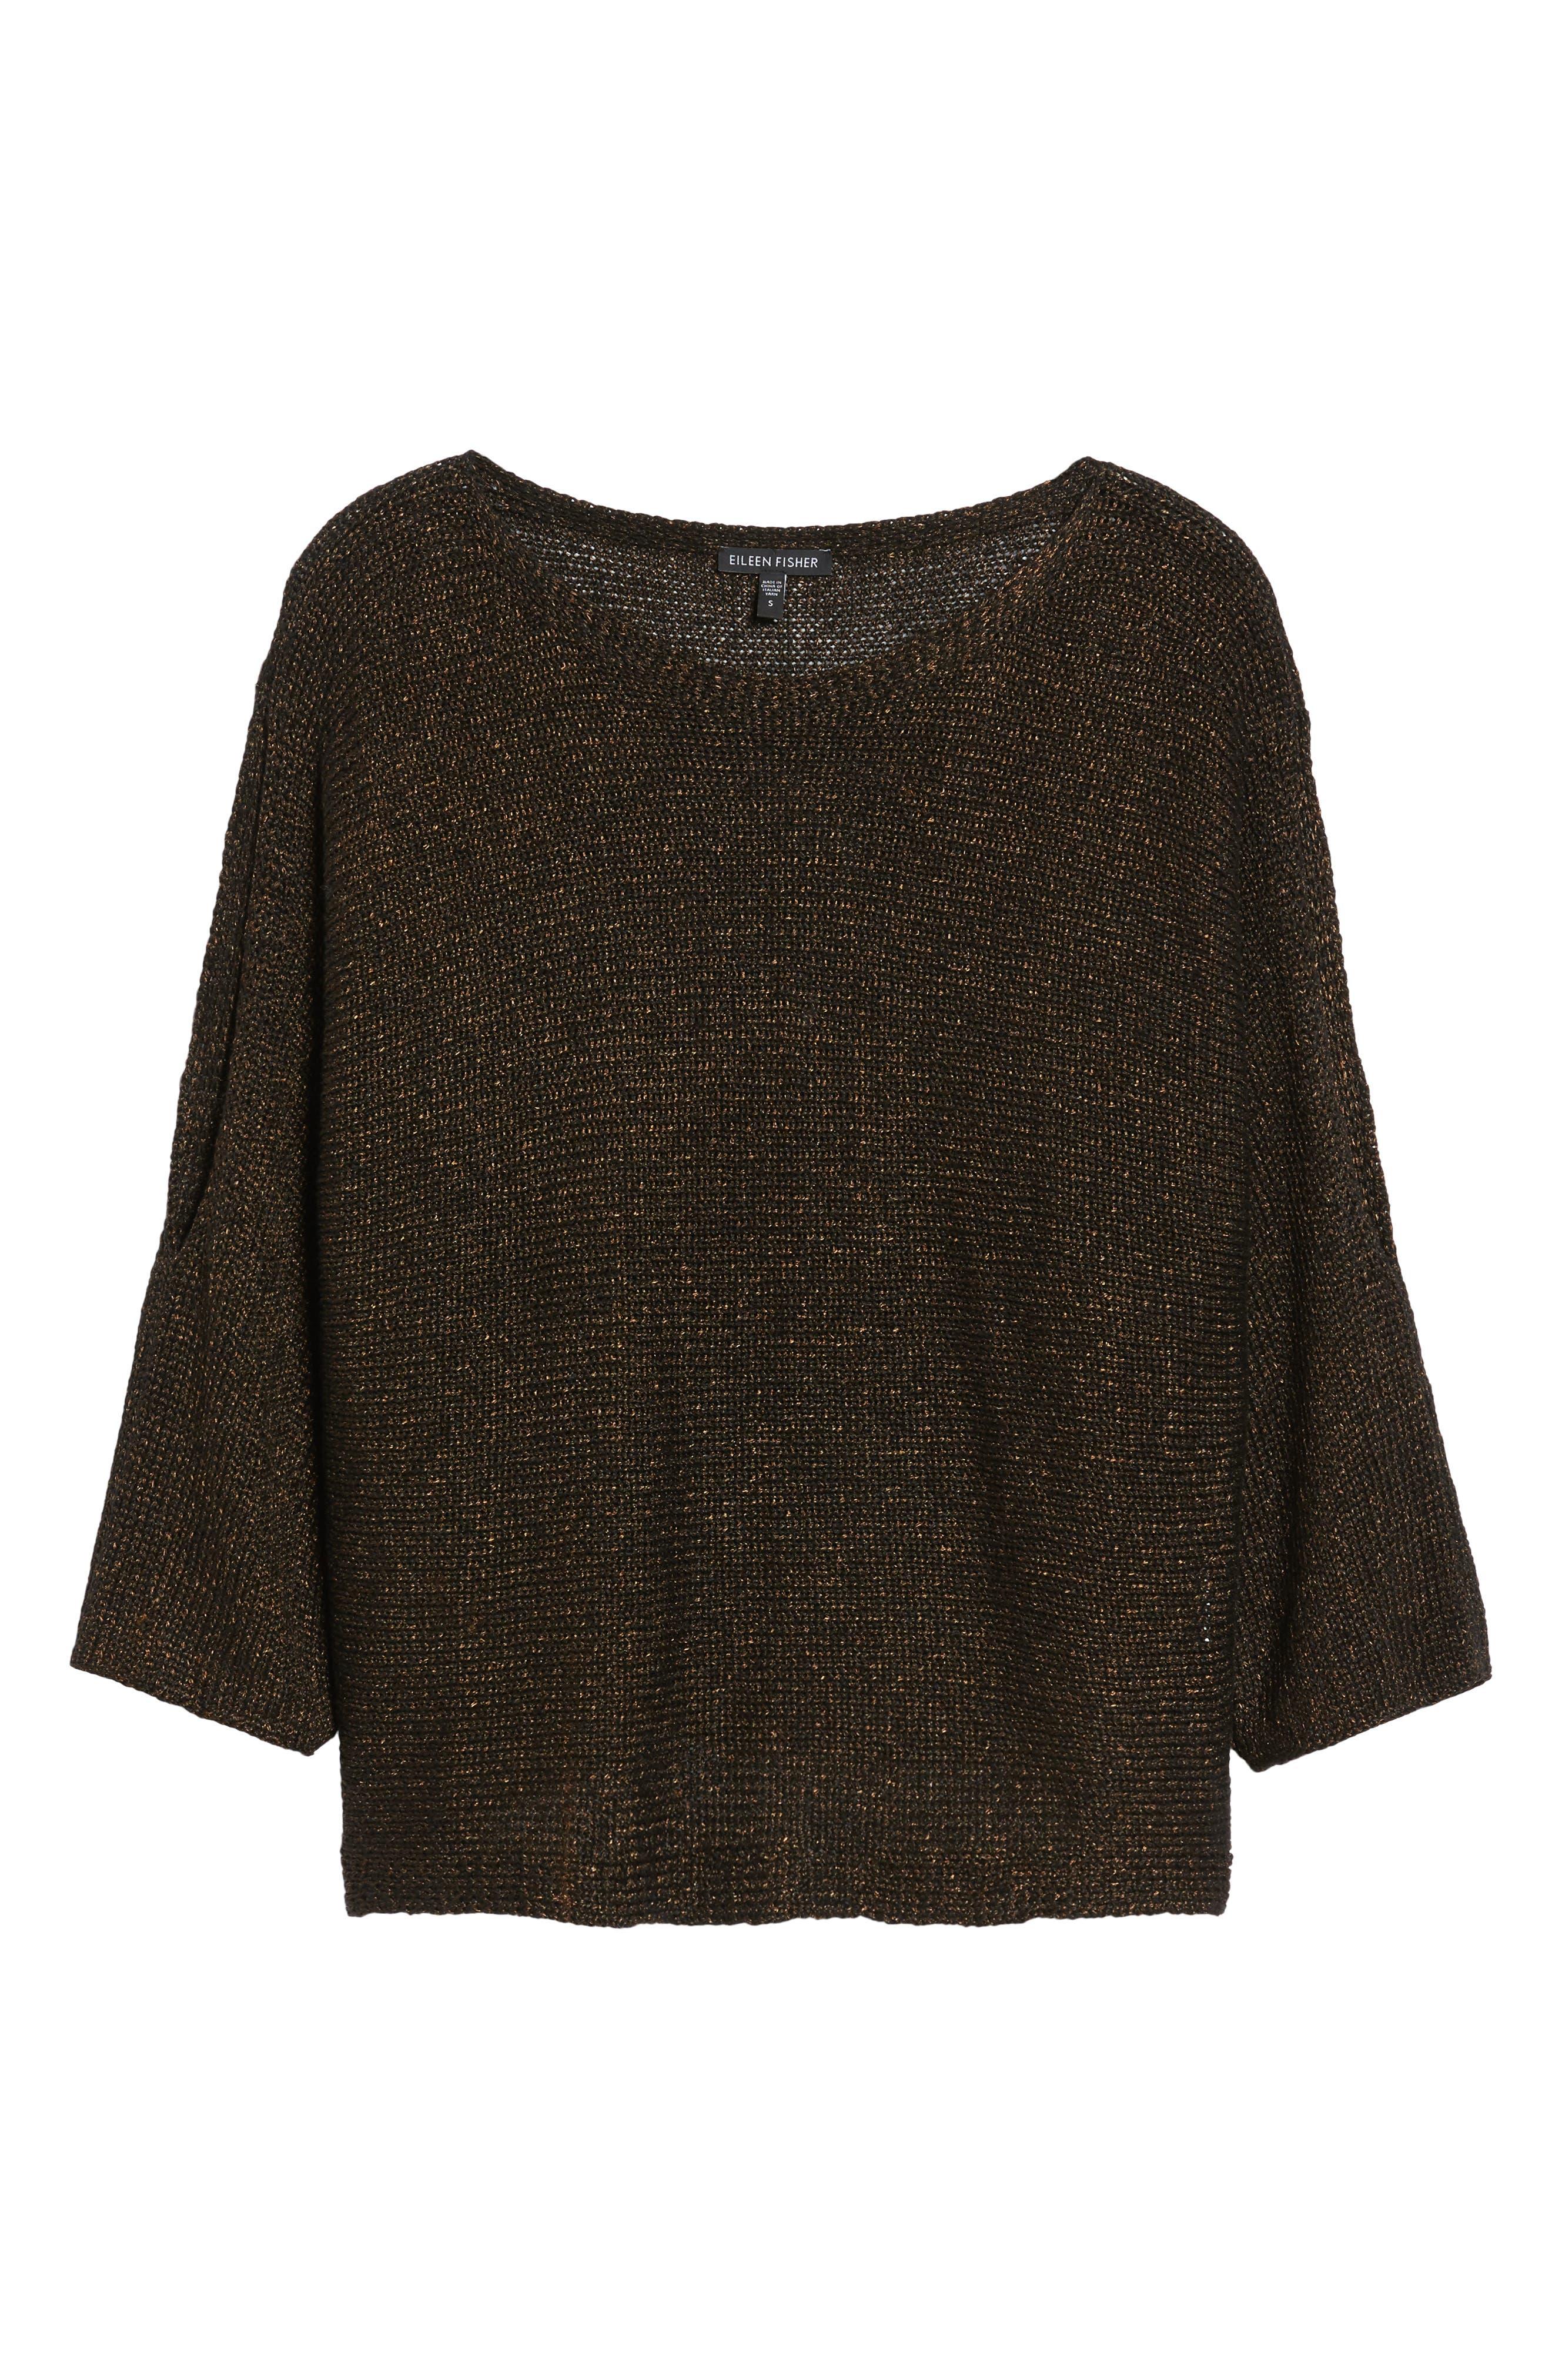 Metallic Organic Linen Blend Sweater,                             Alternate thumbnail 6, color,                             207